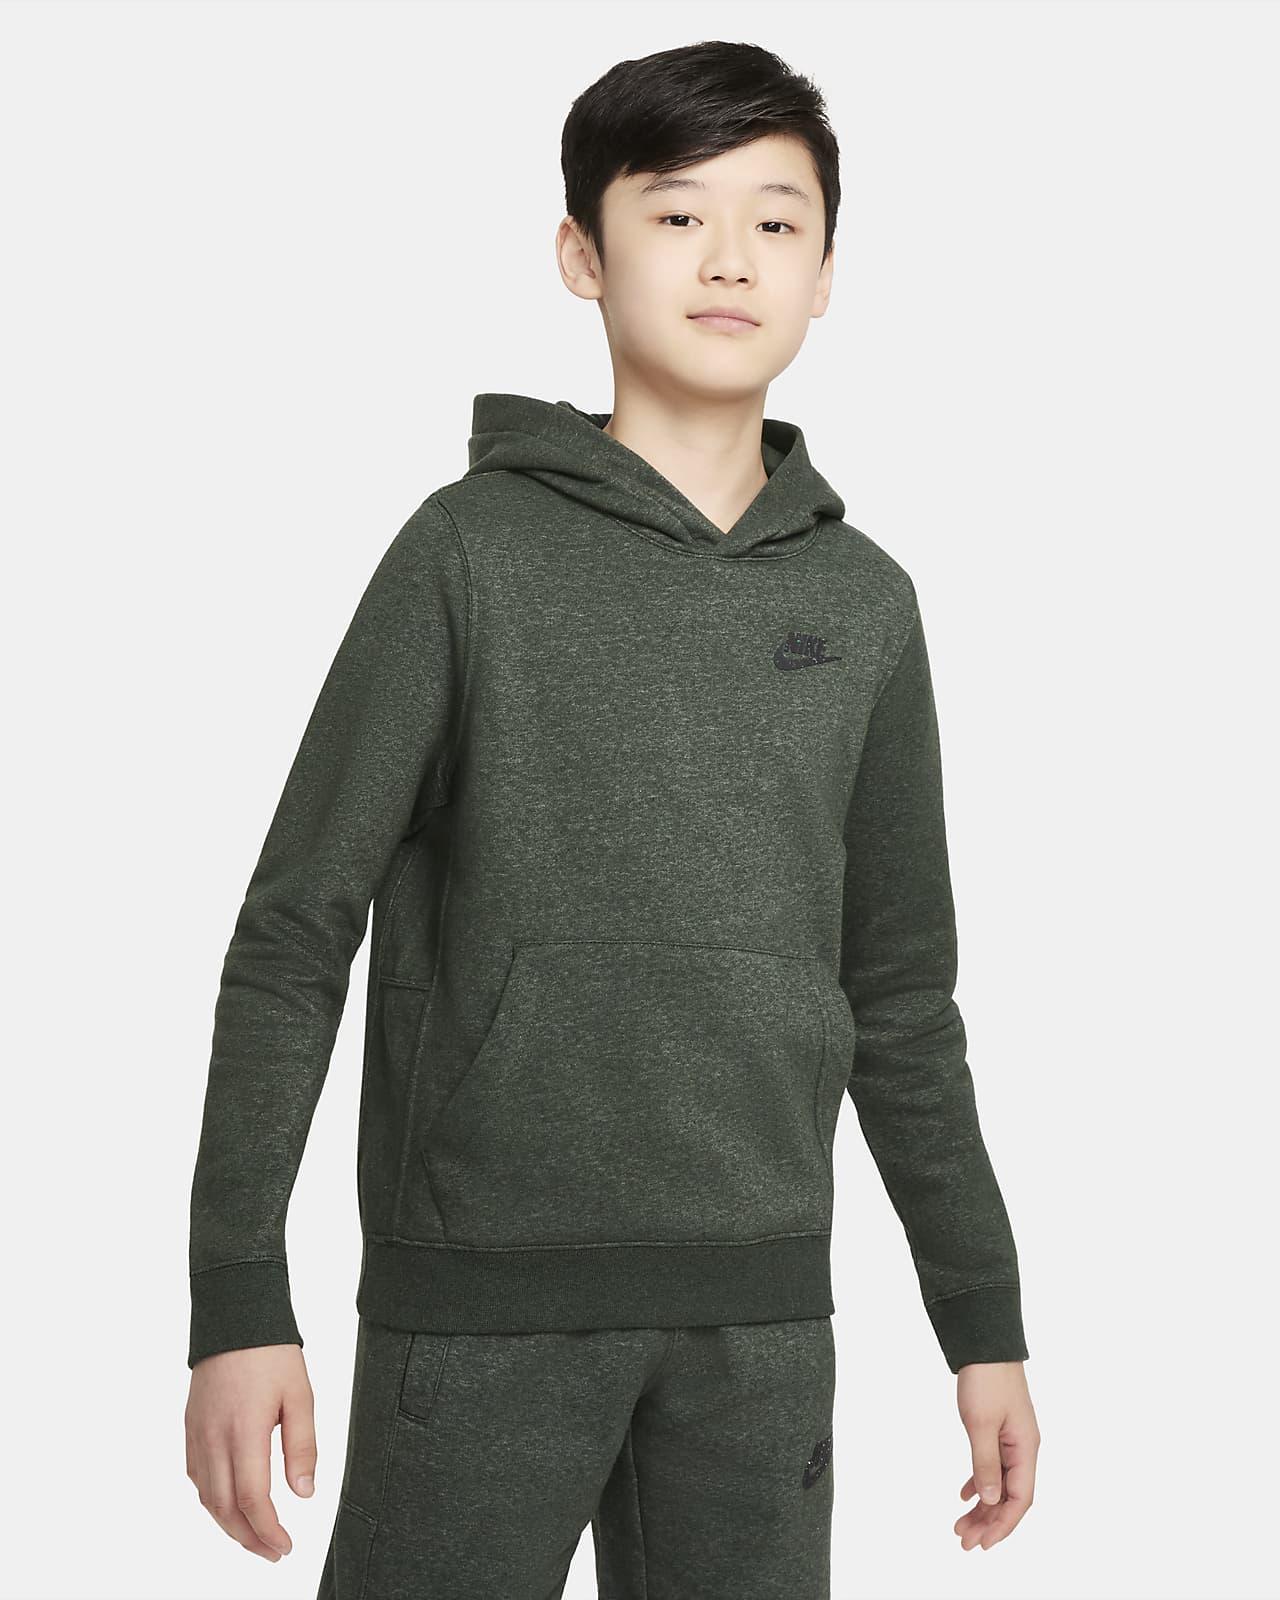 Nike Sportswear Zero Hoodie voor kids